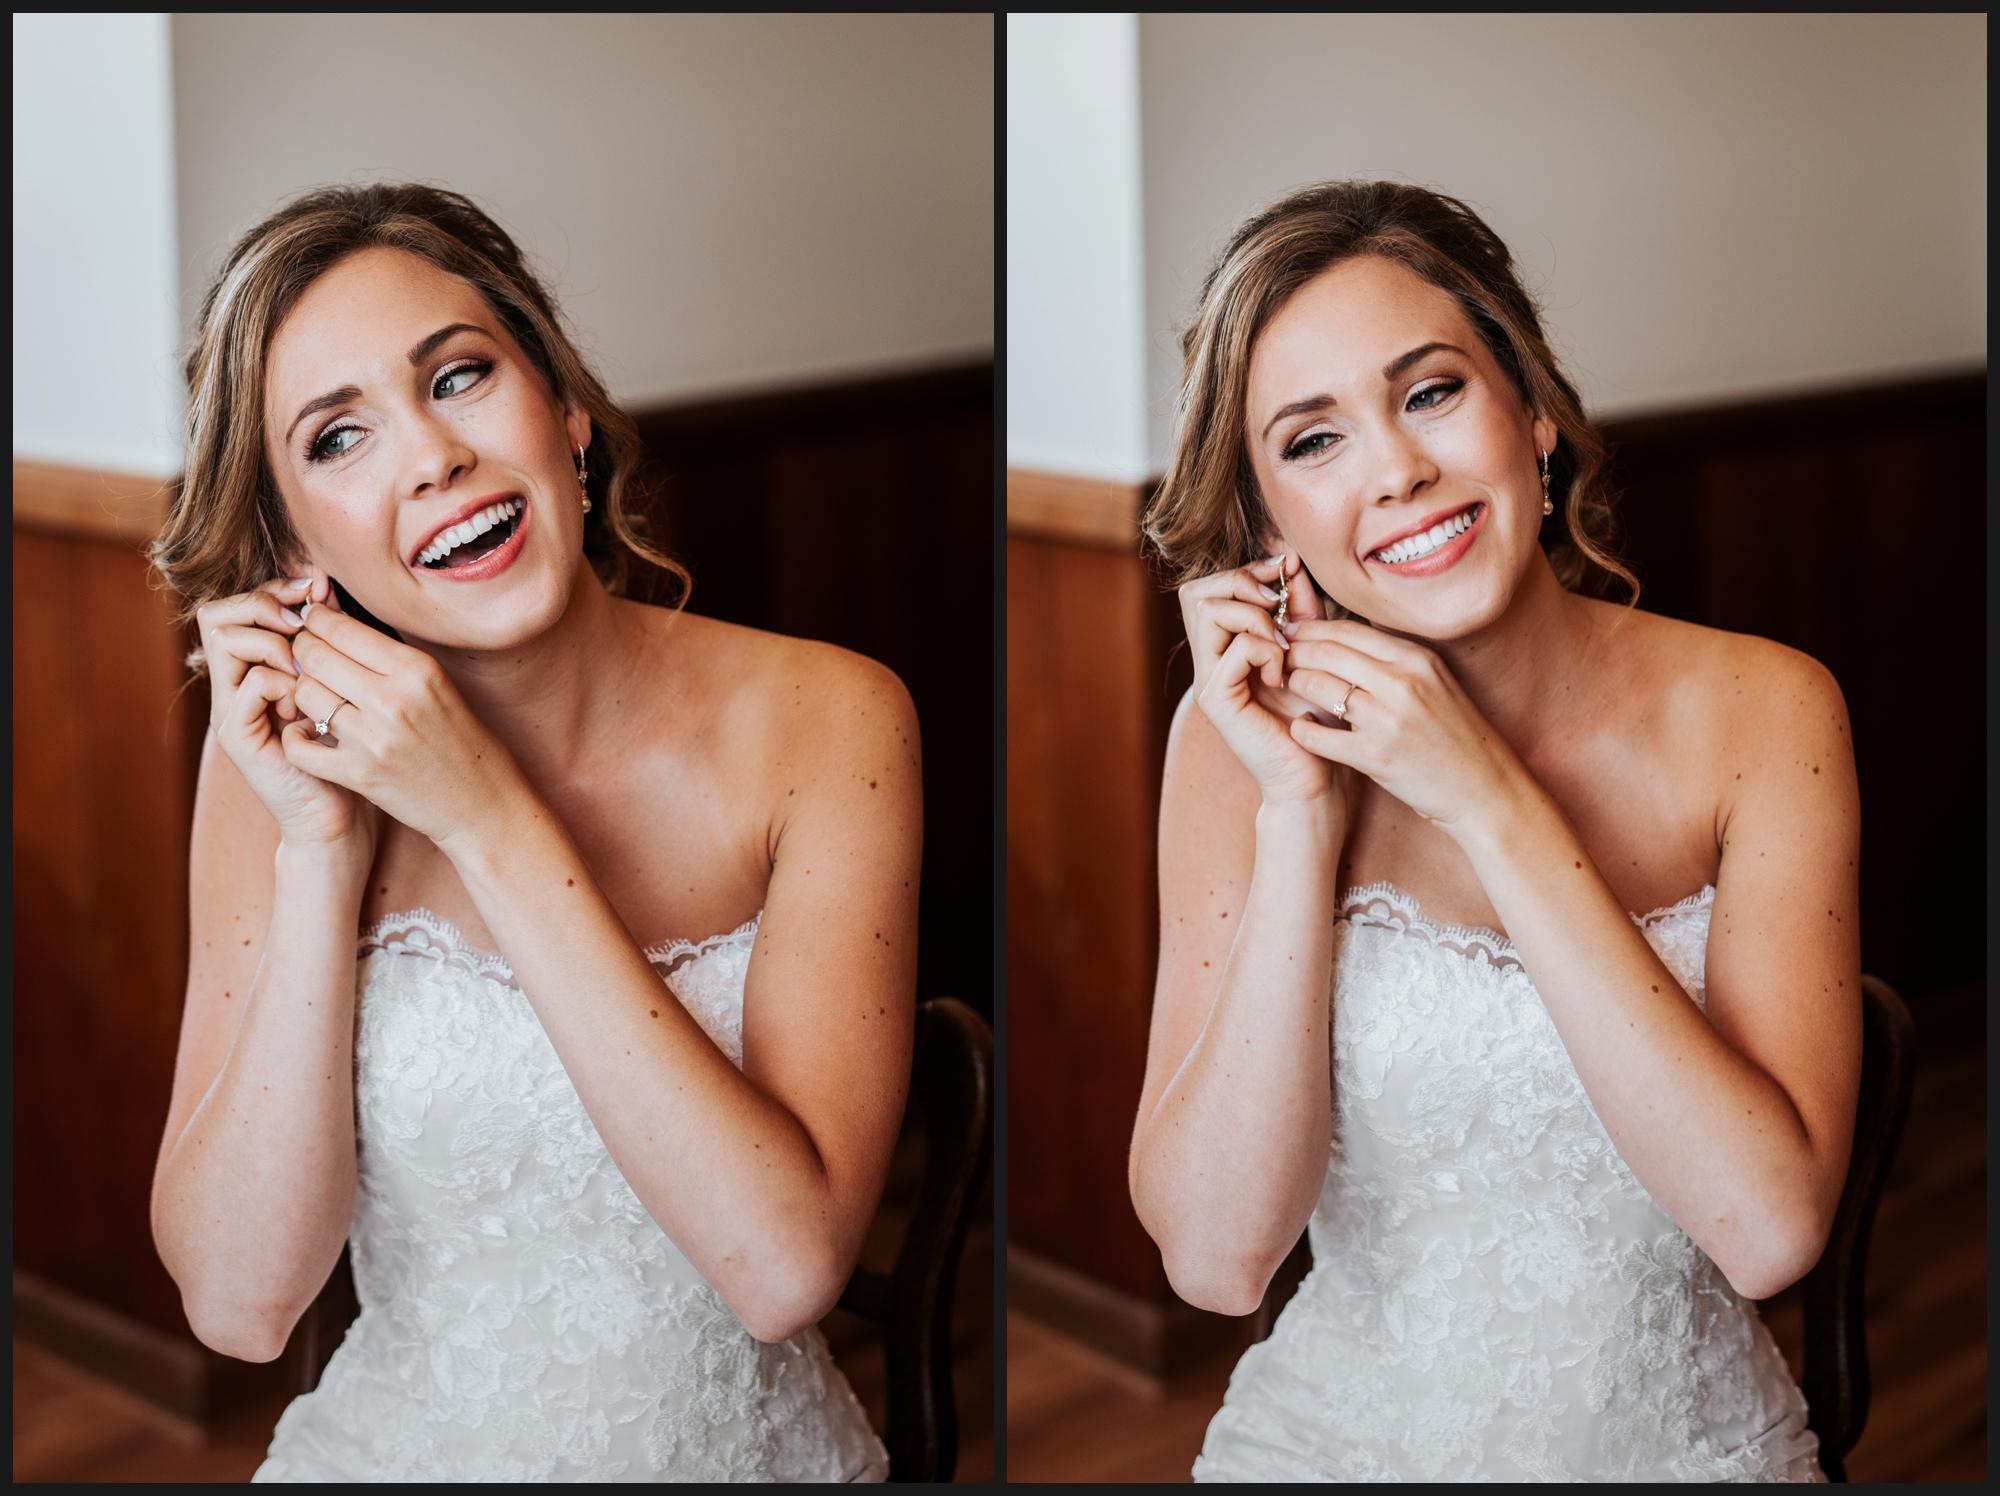 Orlando-Wedding-Photographer-destination-wedding-photographer-florida-wedding-photographer-bohemian-wedding-photographer_0014.jpg